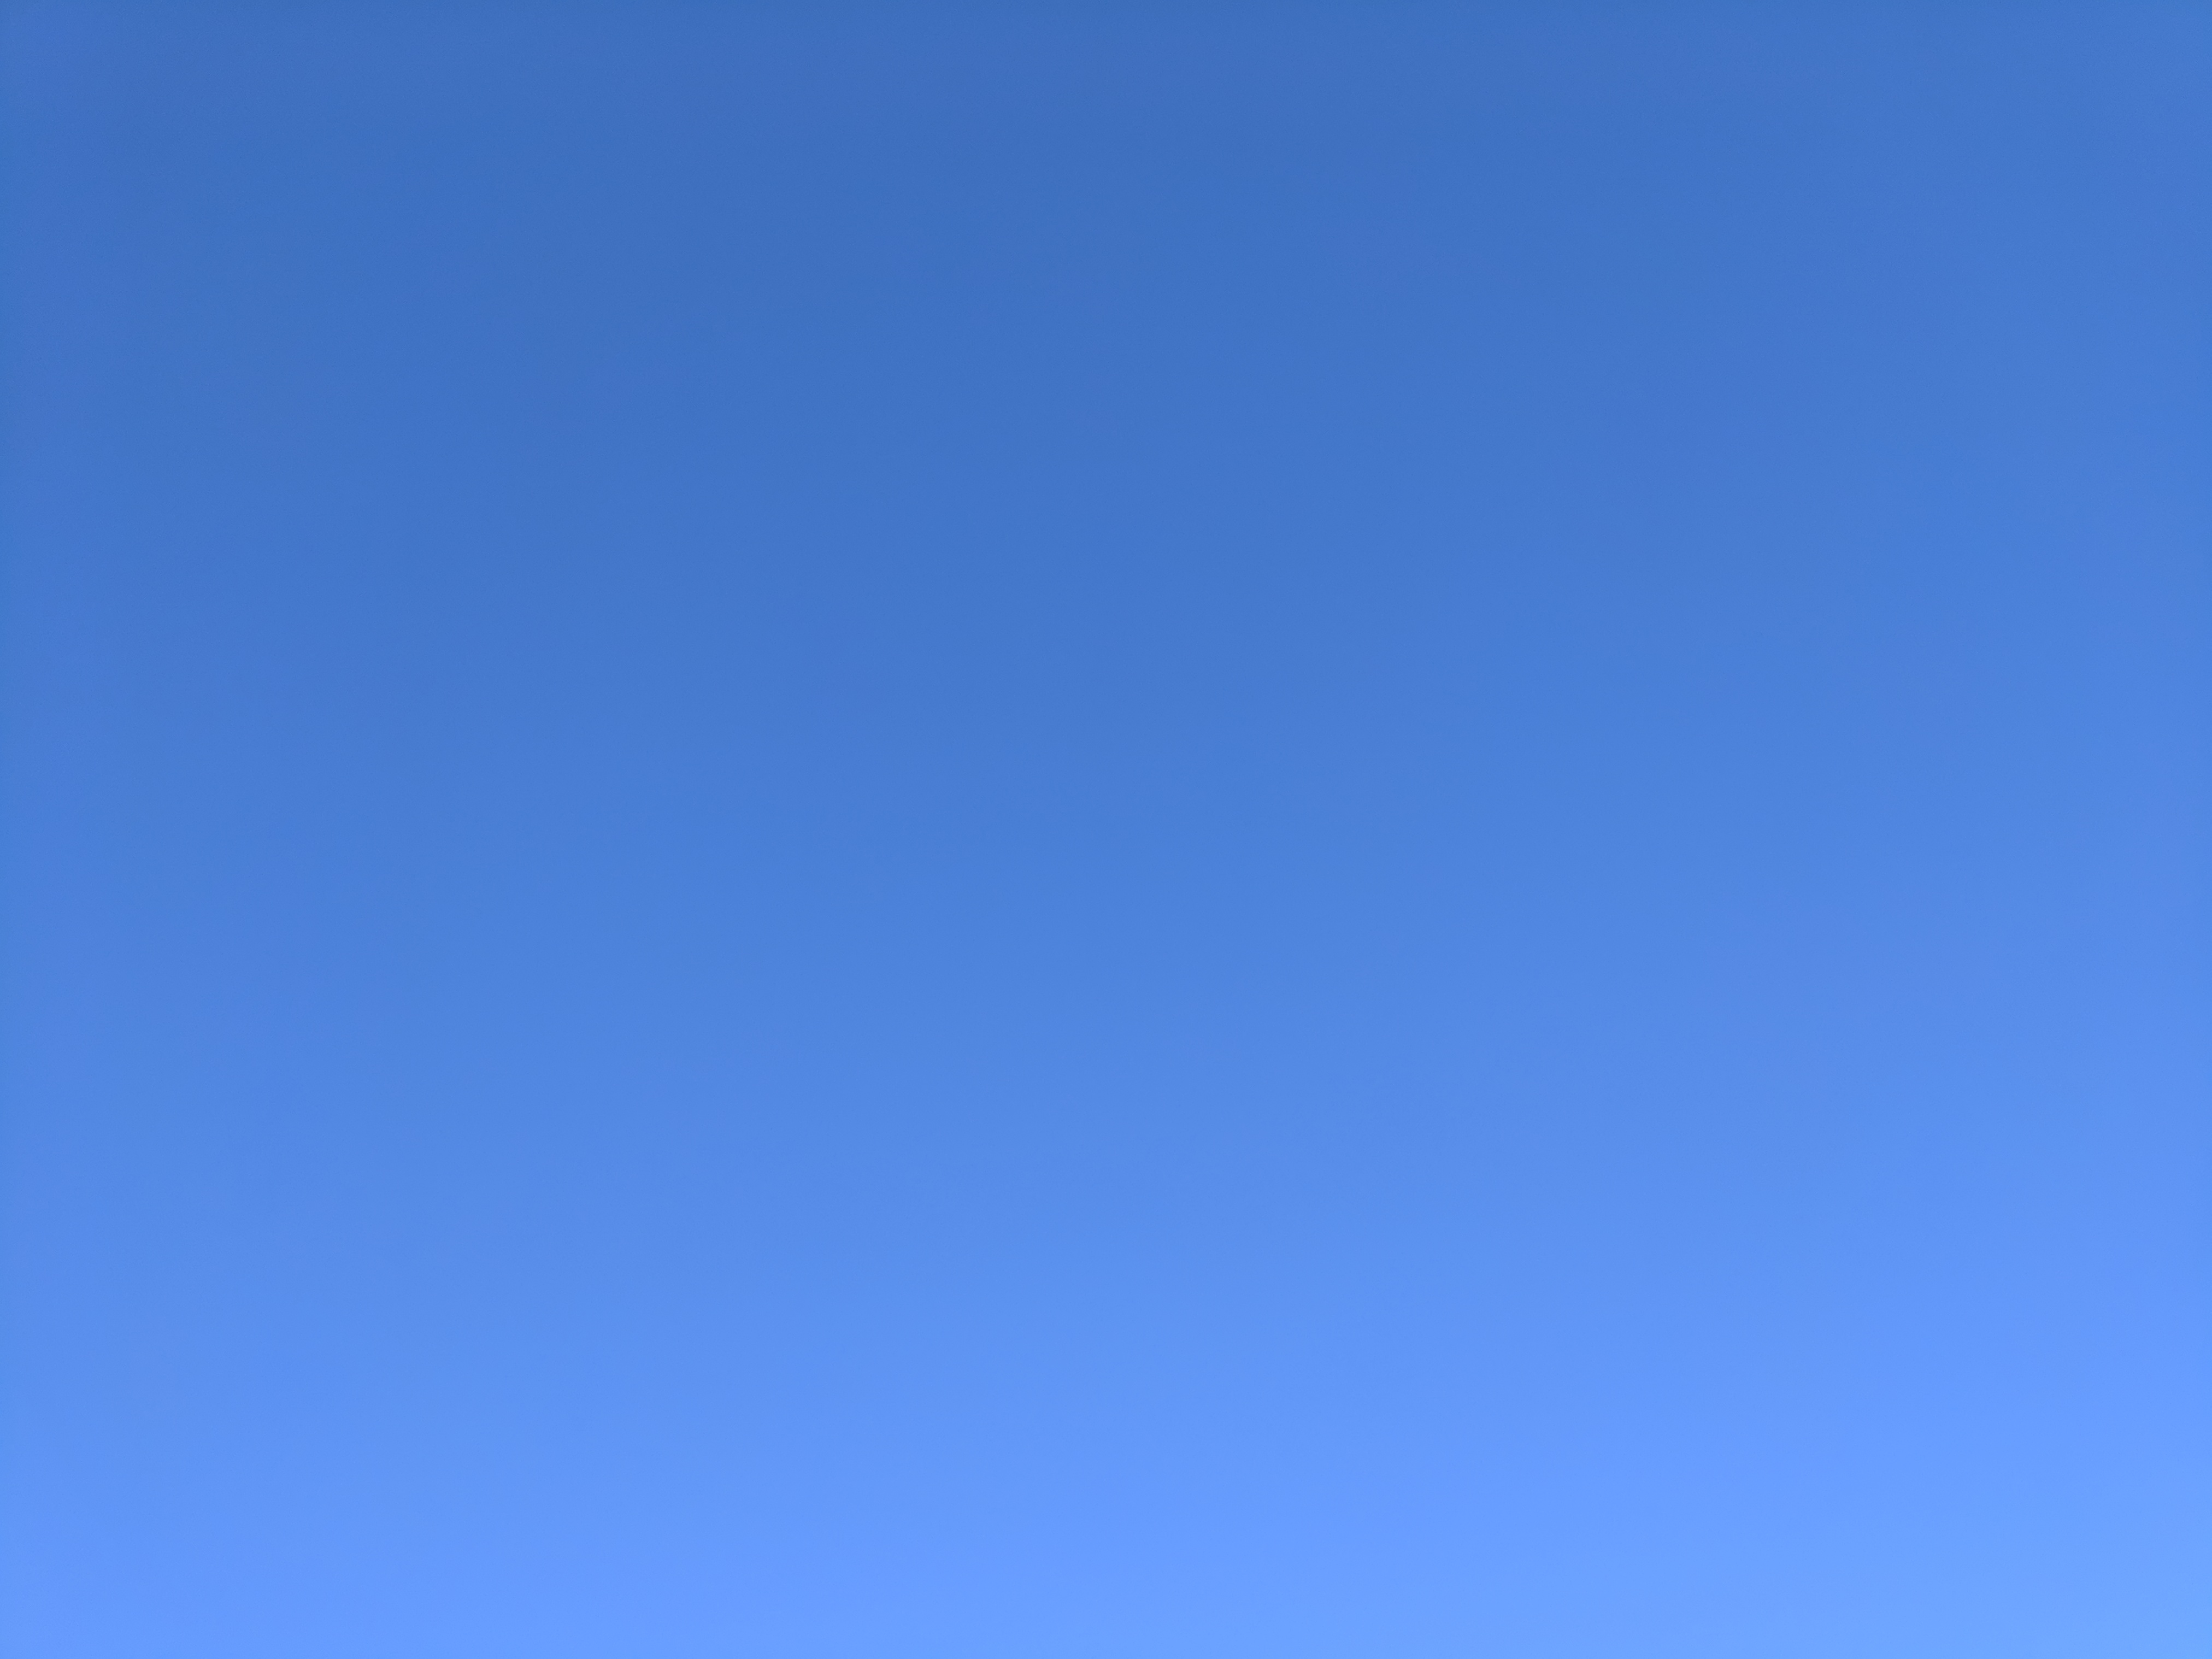 Blue sky above Sydney, Australia